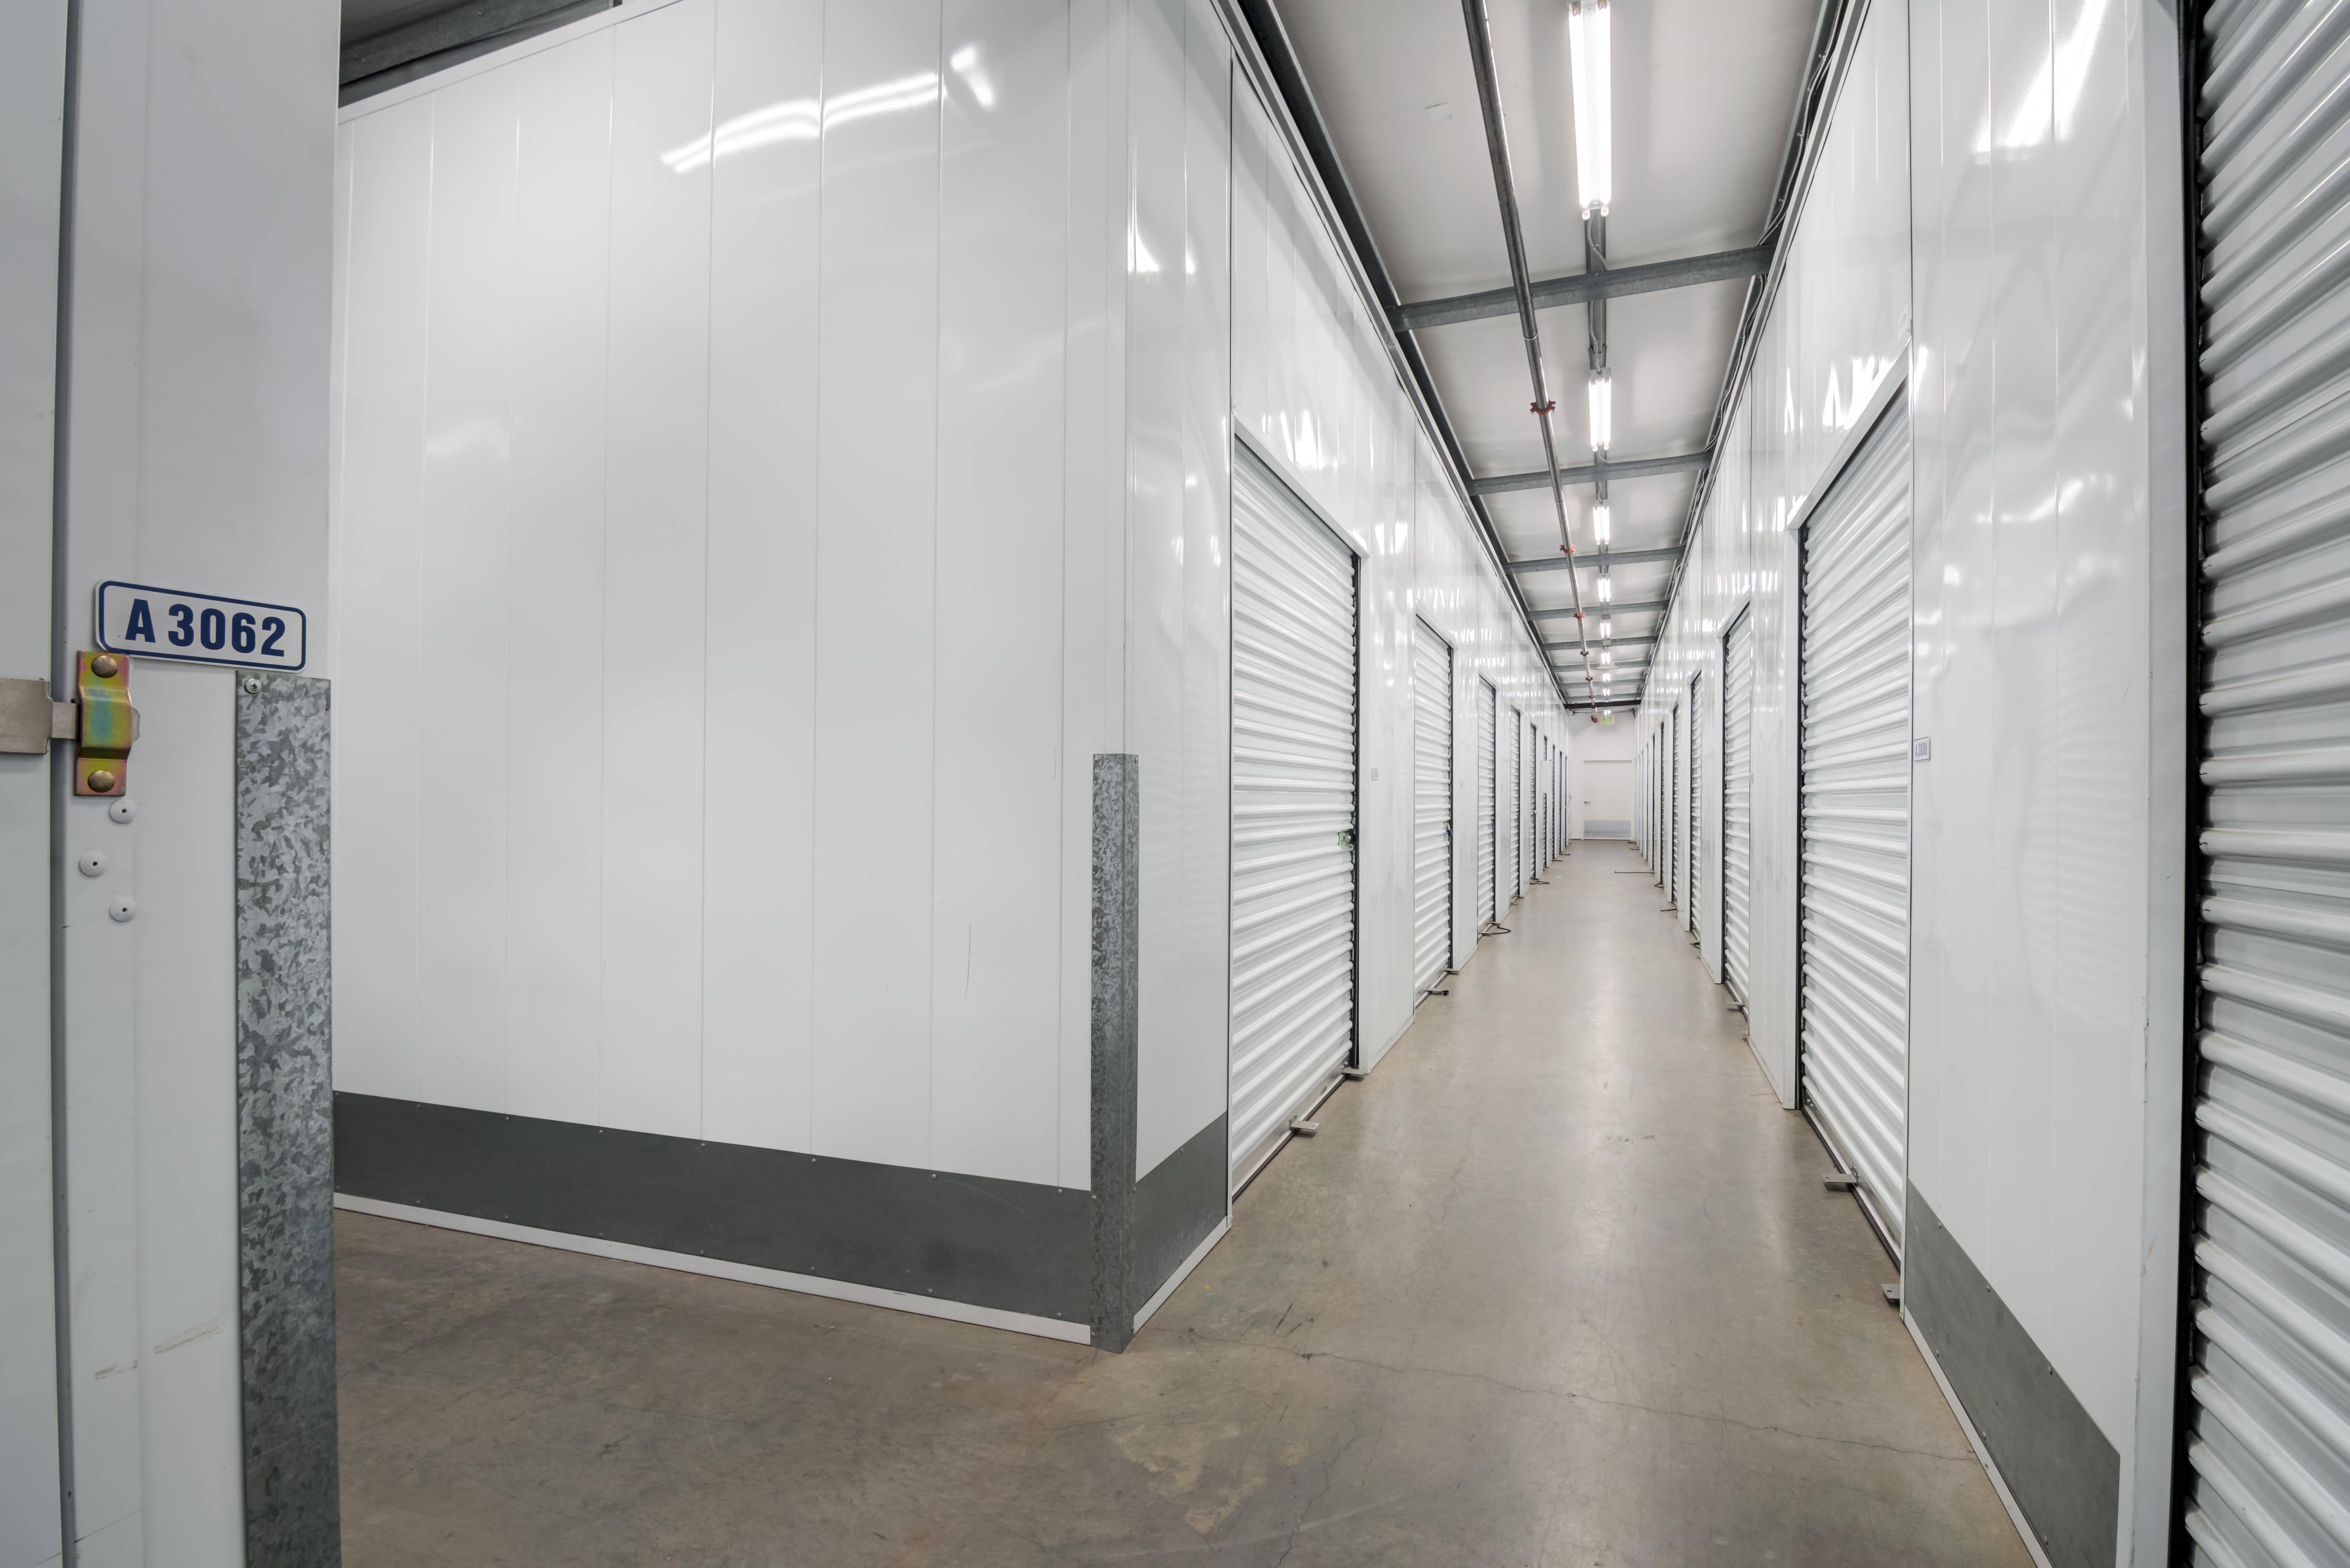 Indoor storage at Storage Etc... Hancock St in San Diego,CA